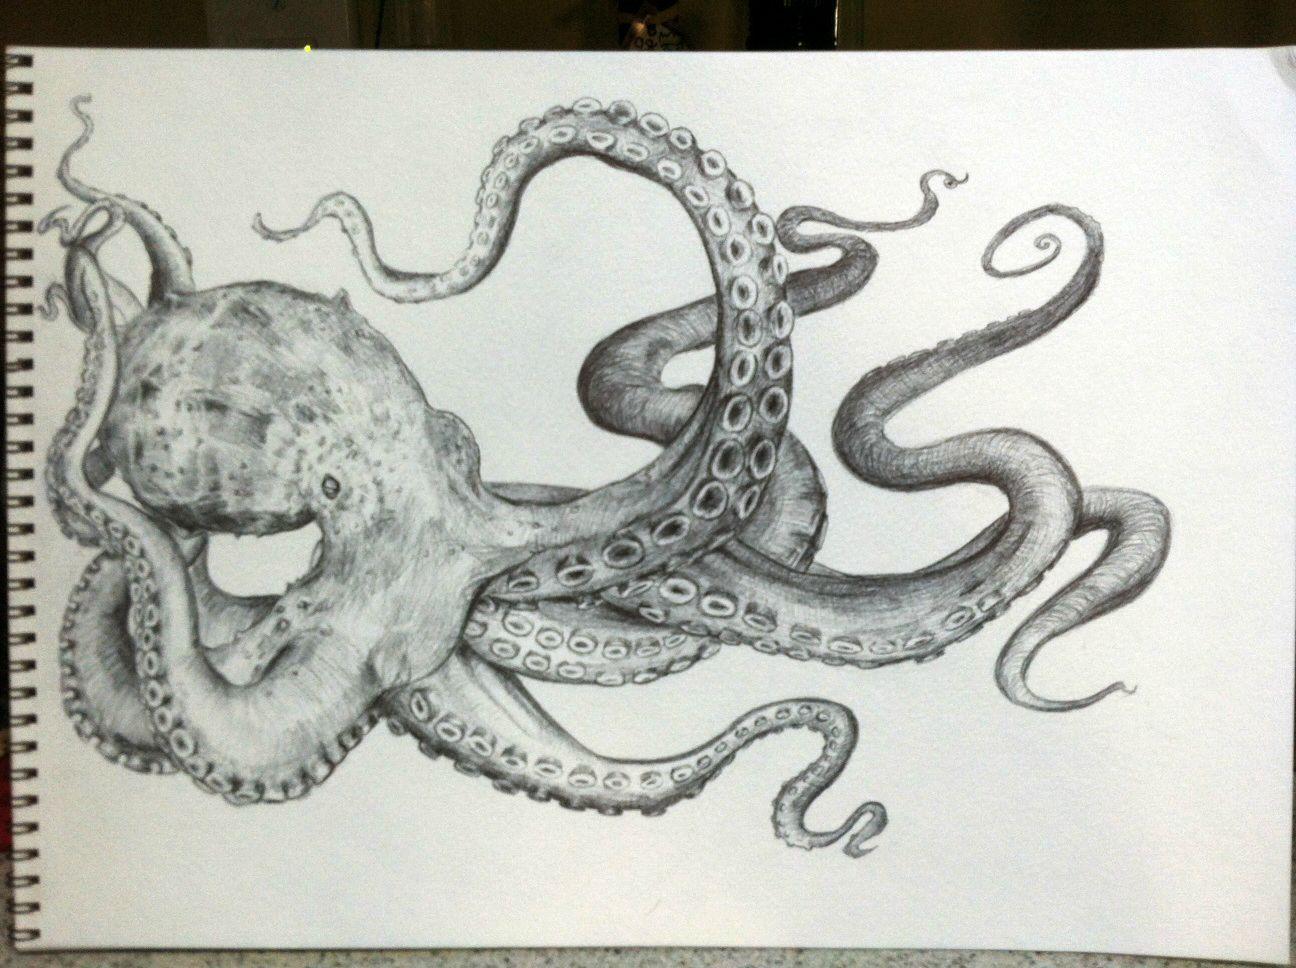 Octopus Drawing Tattoos Pinterest Octopus Drawing Octopus